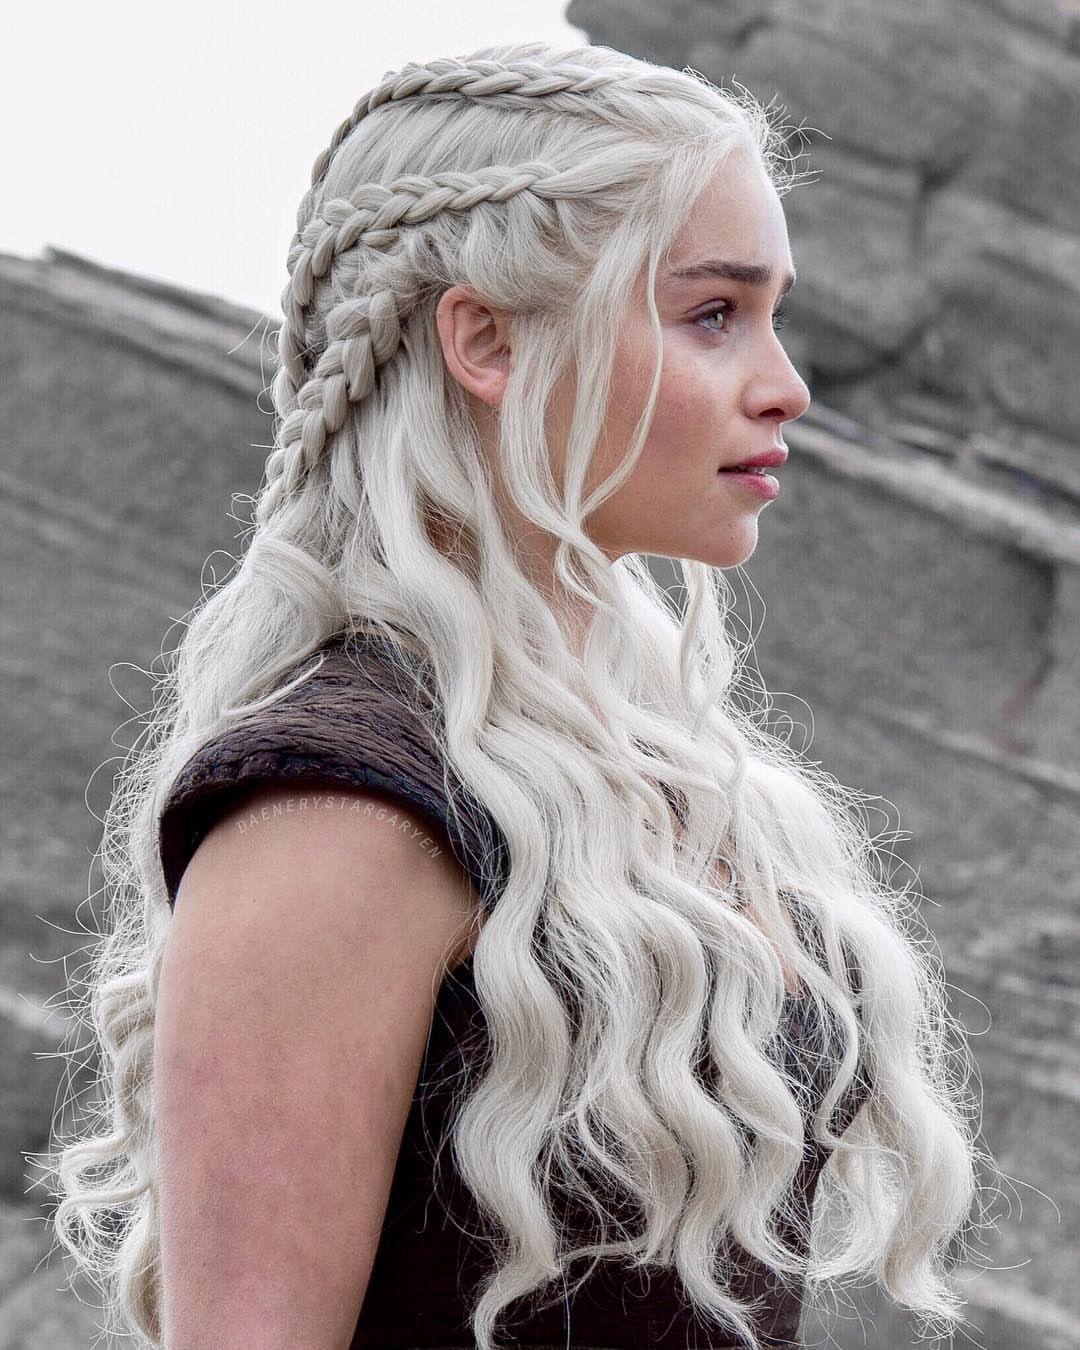 Pin By Lena On Game Of Thrones Khaleesi Hair Targaryen Hair Daenerys Targaryen Hair